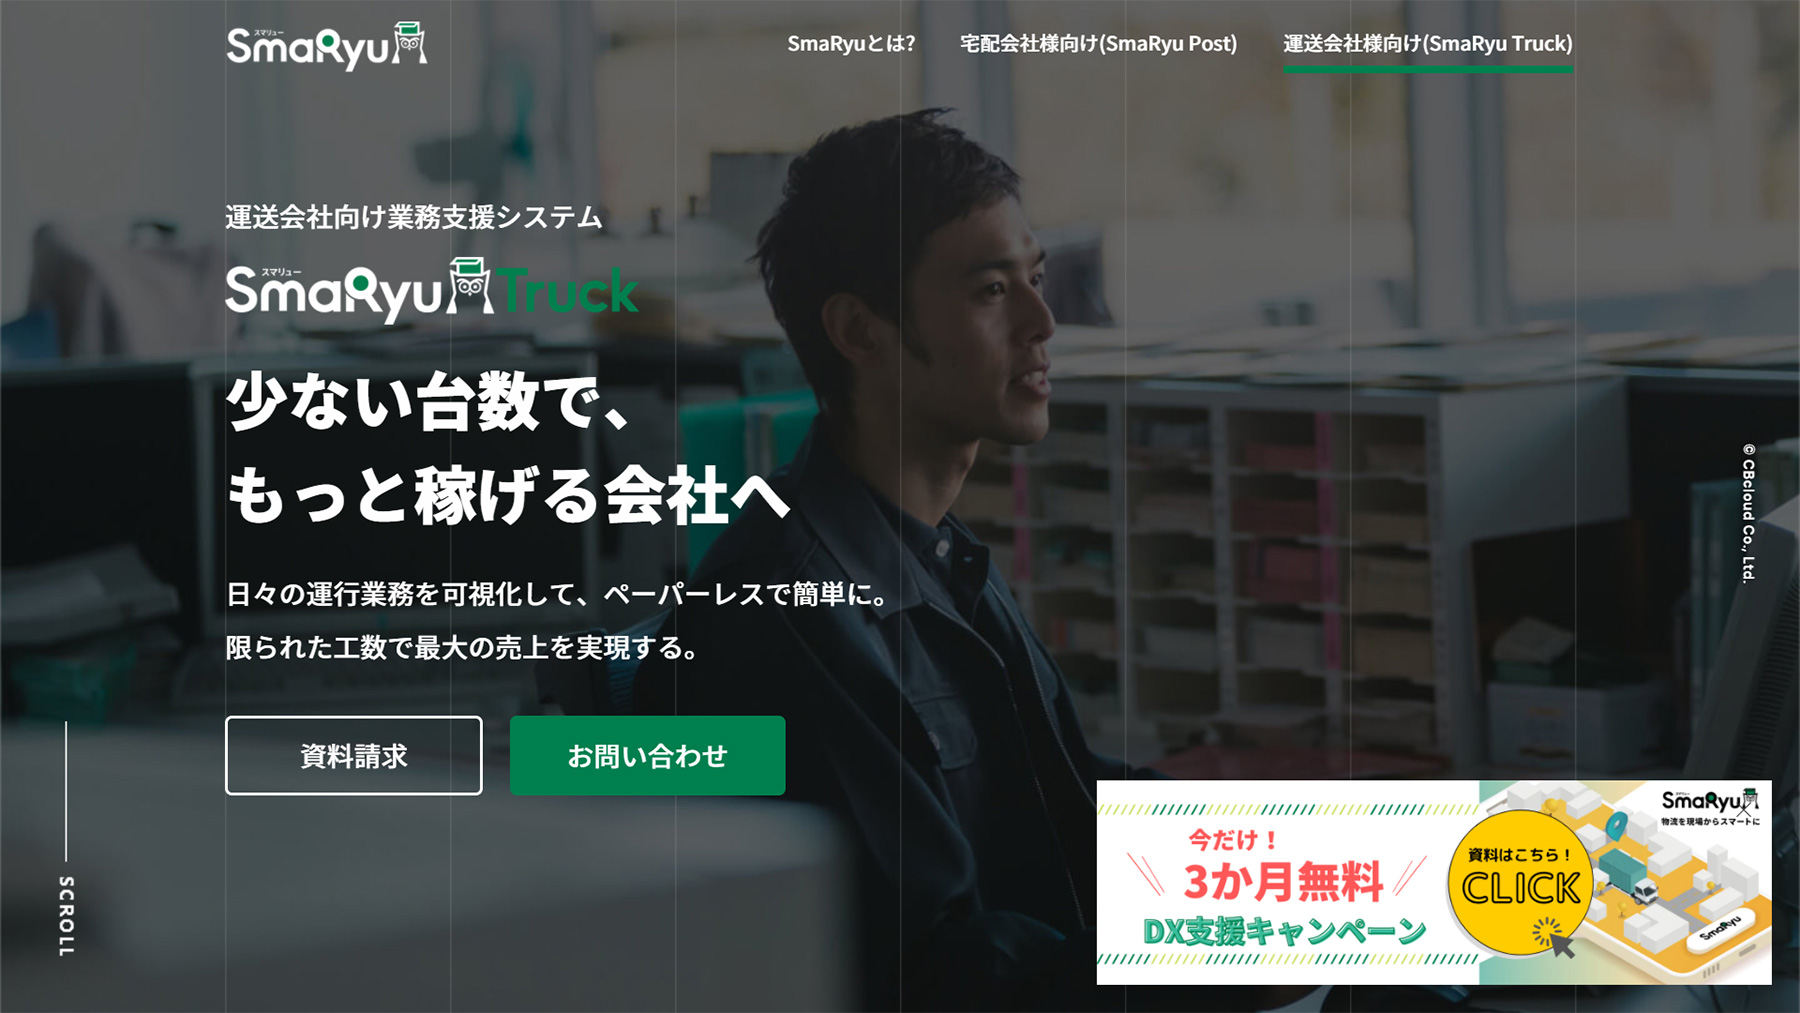 SmaRyu Truck公式Webサイト